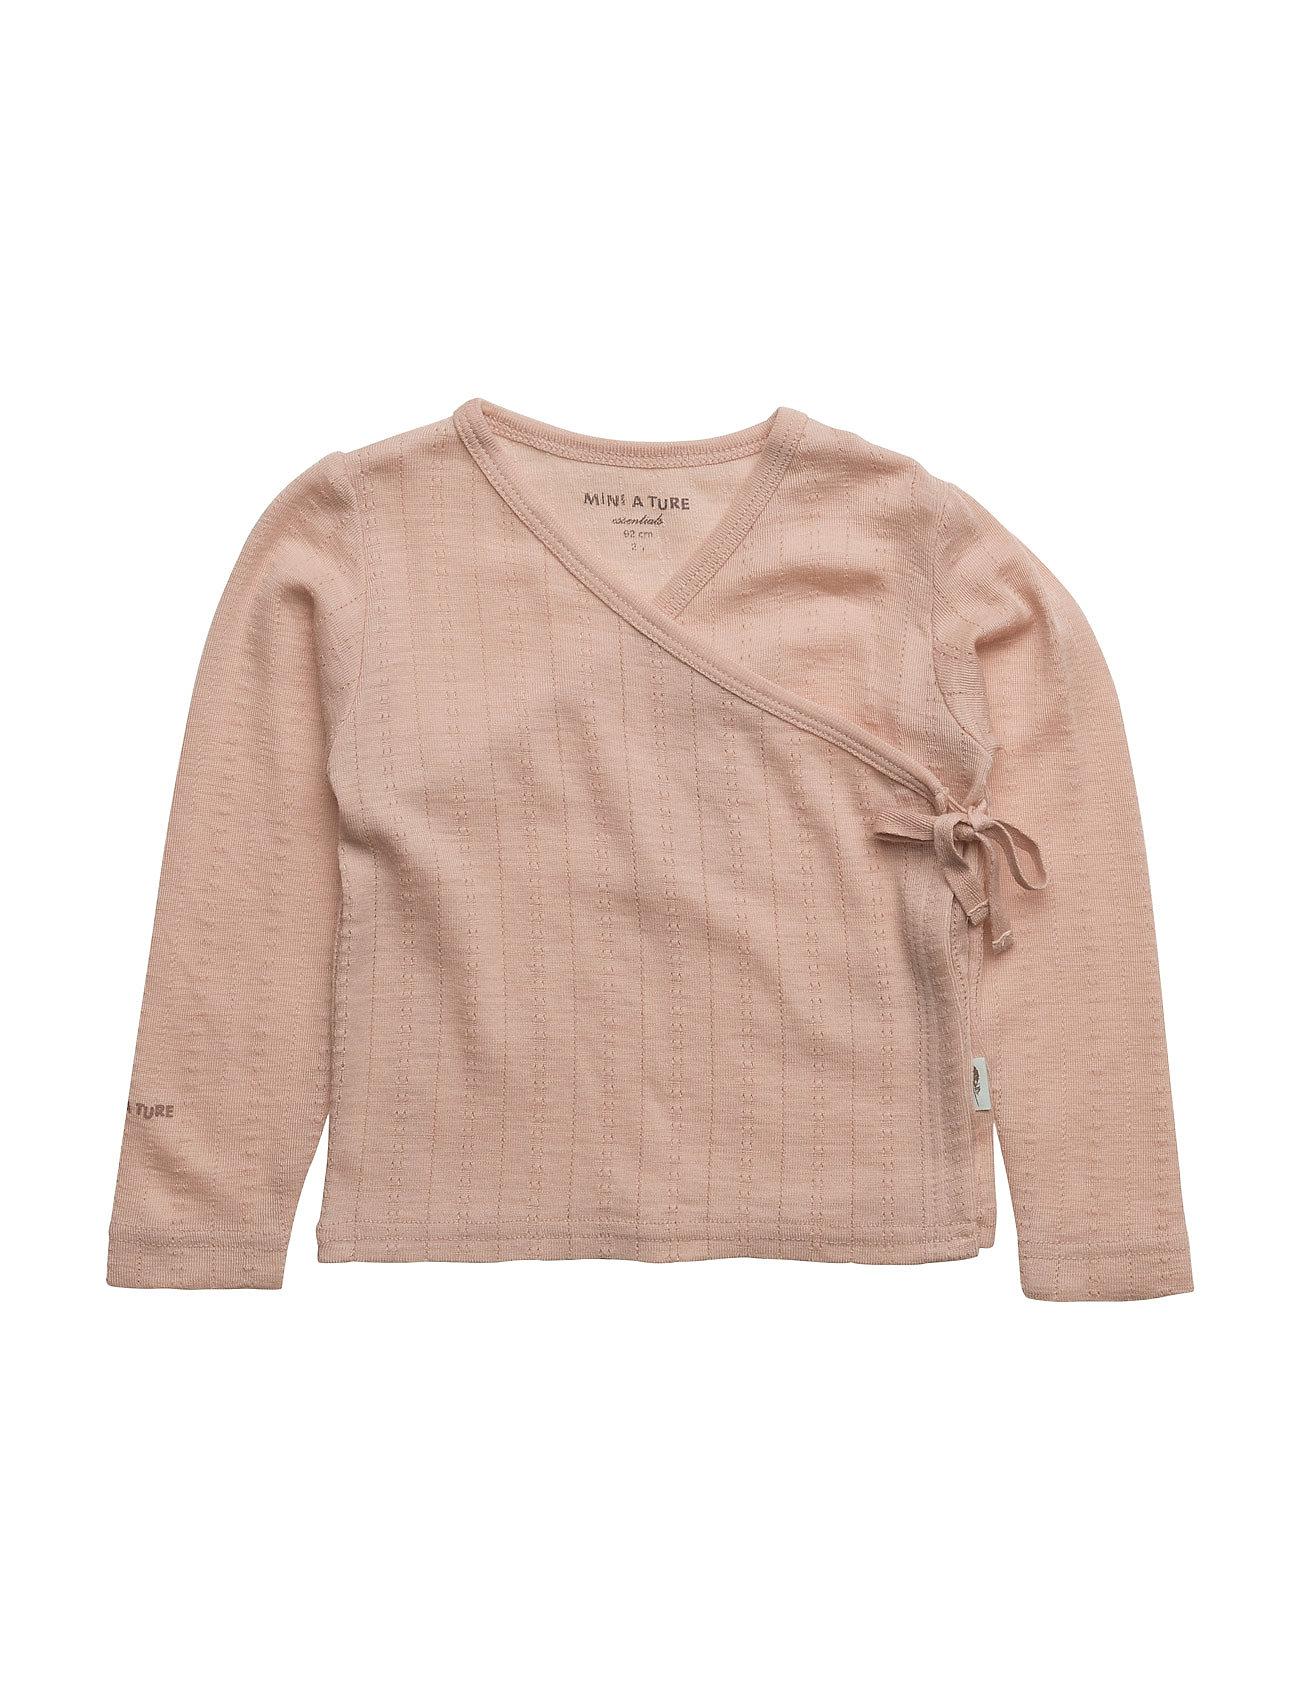 Europa Blouse, B Mini A Ture Langærmede t-shirts til Børn i Rose Dust